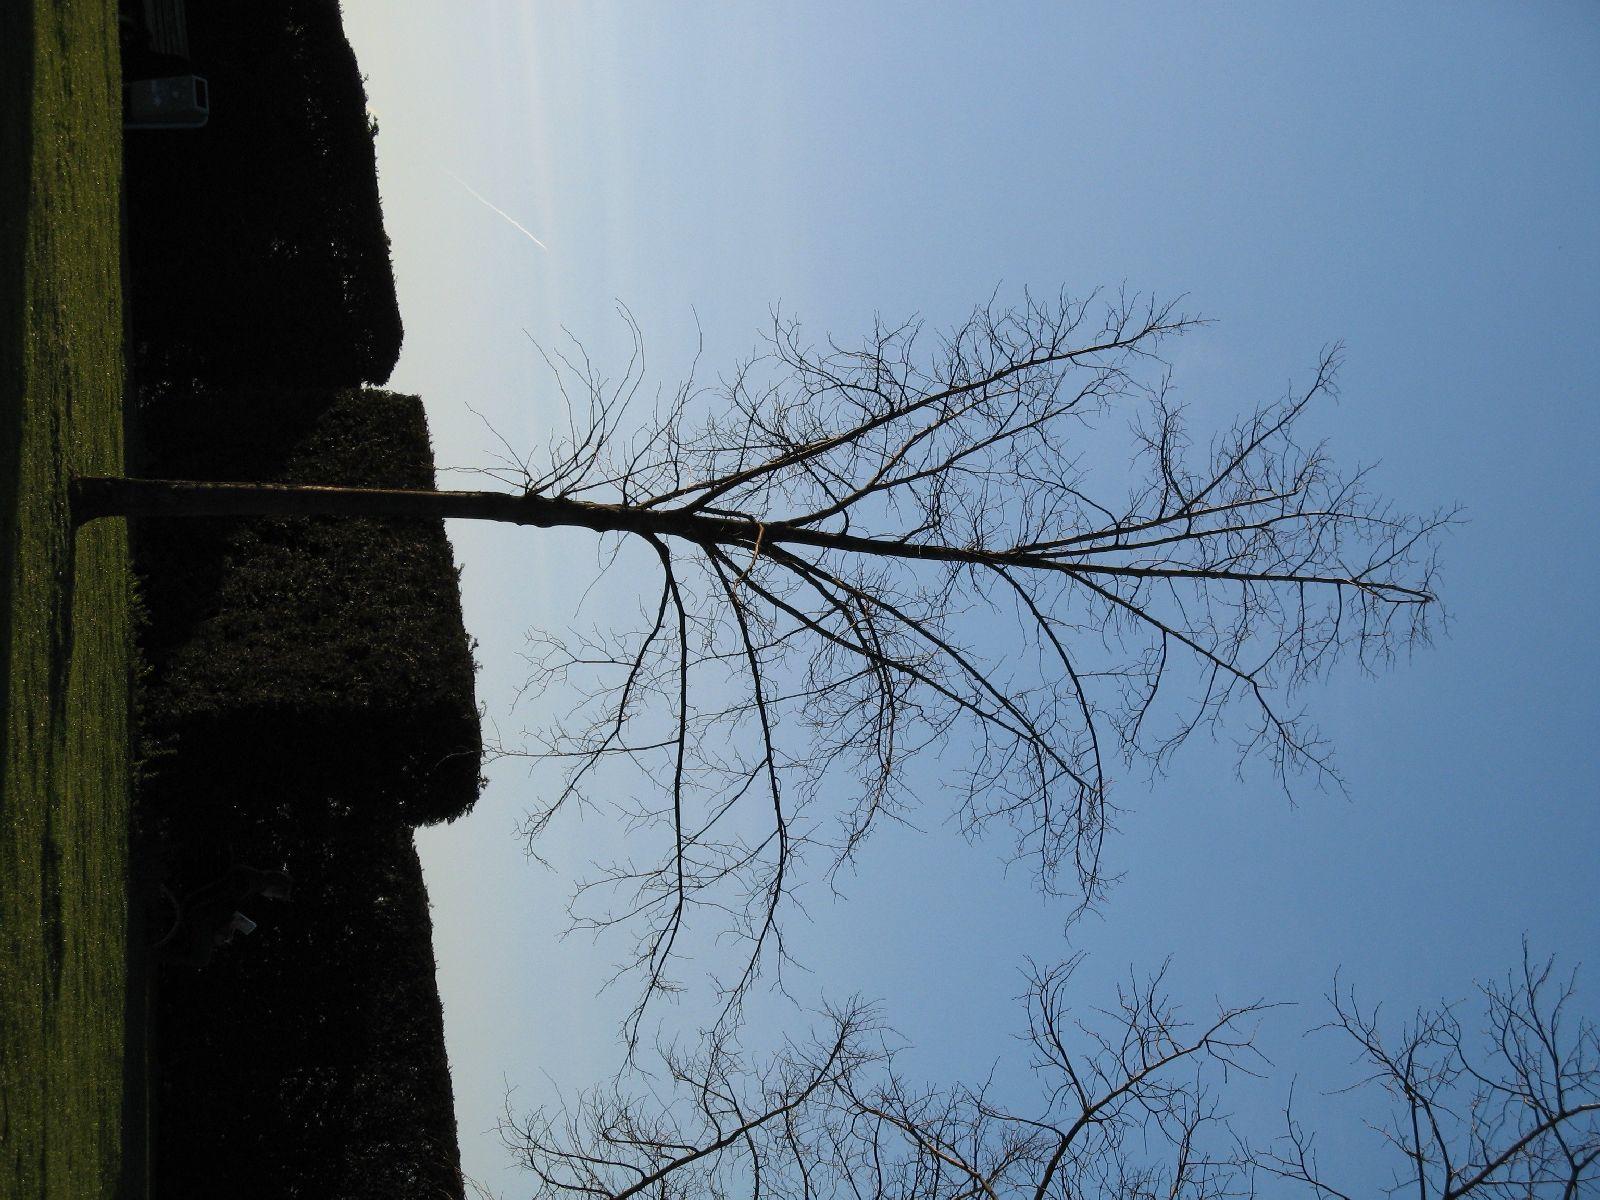 Plants-Trees_Photo_Texture_B_42070